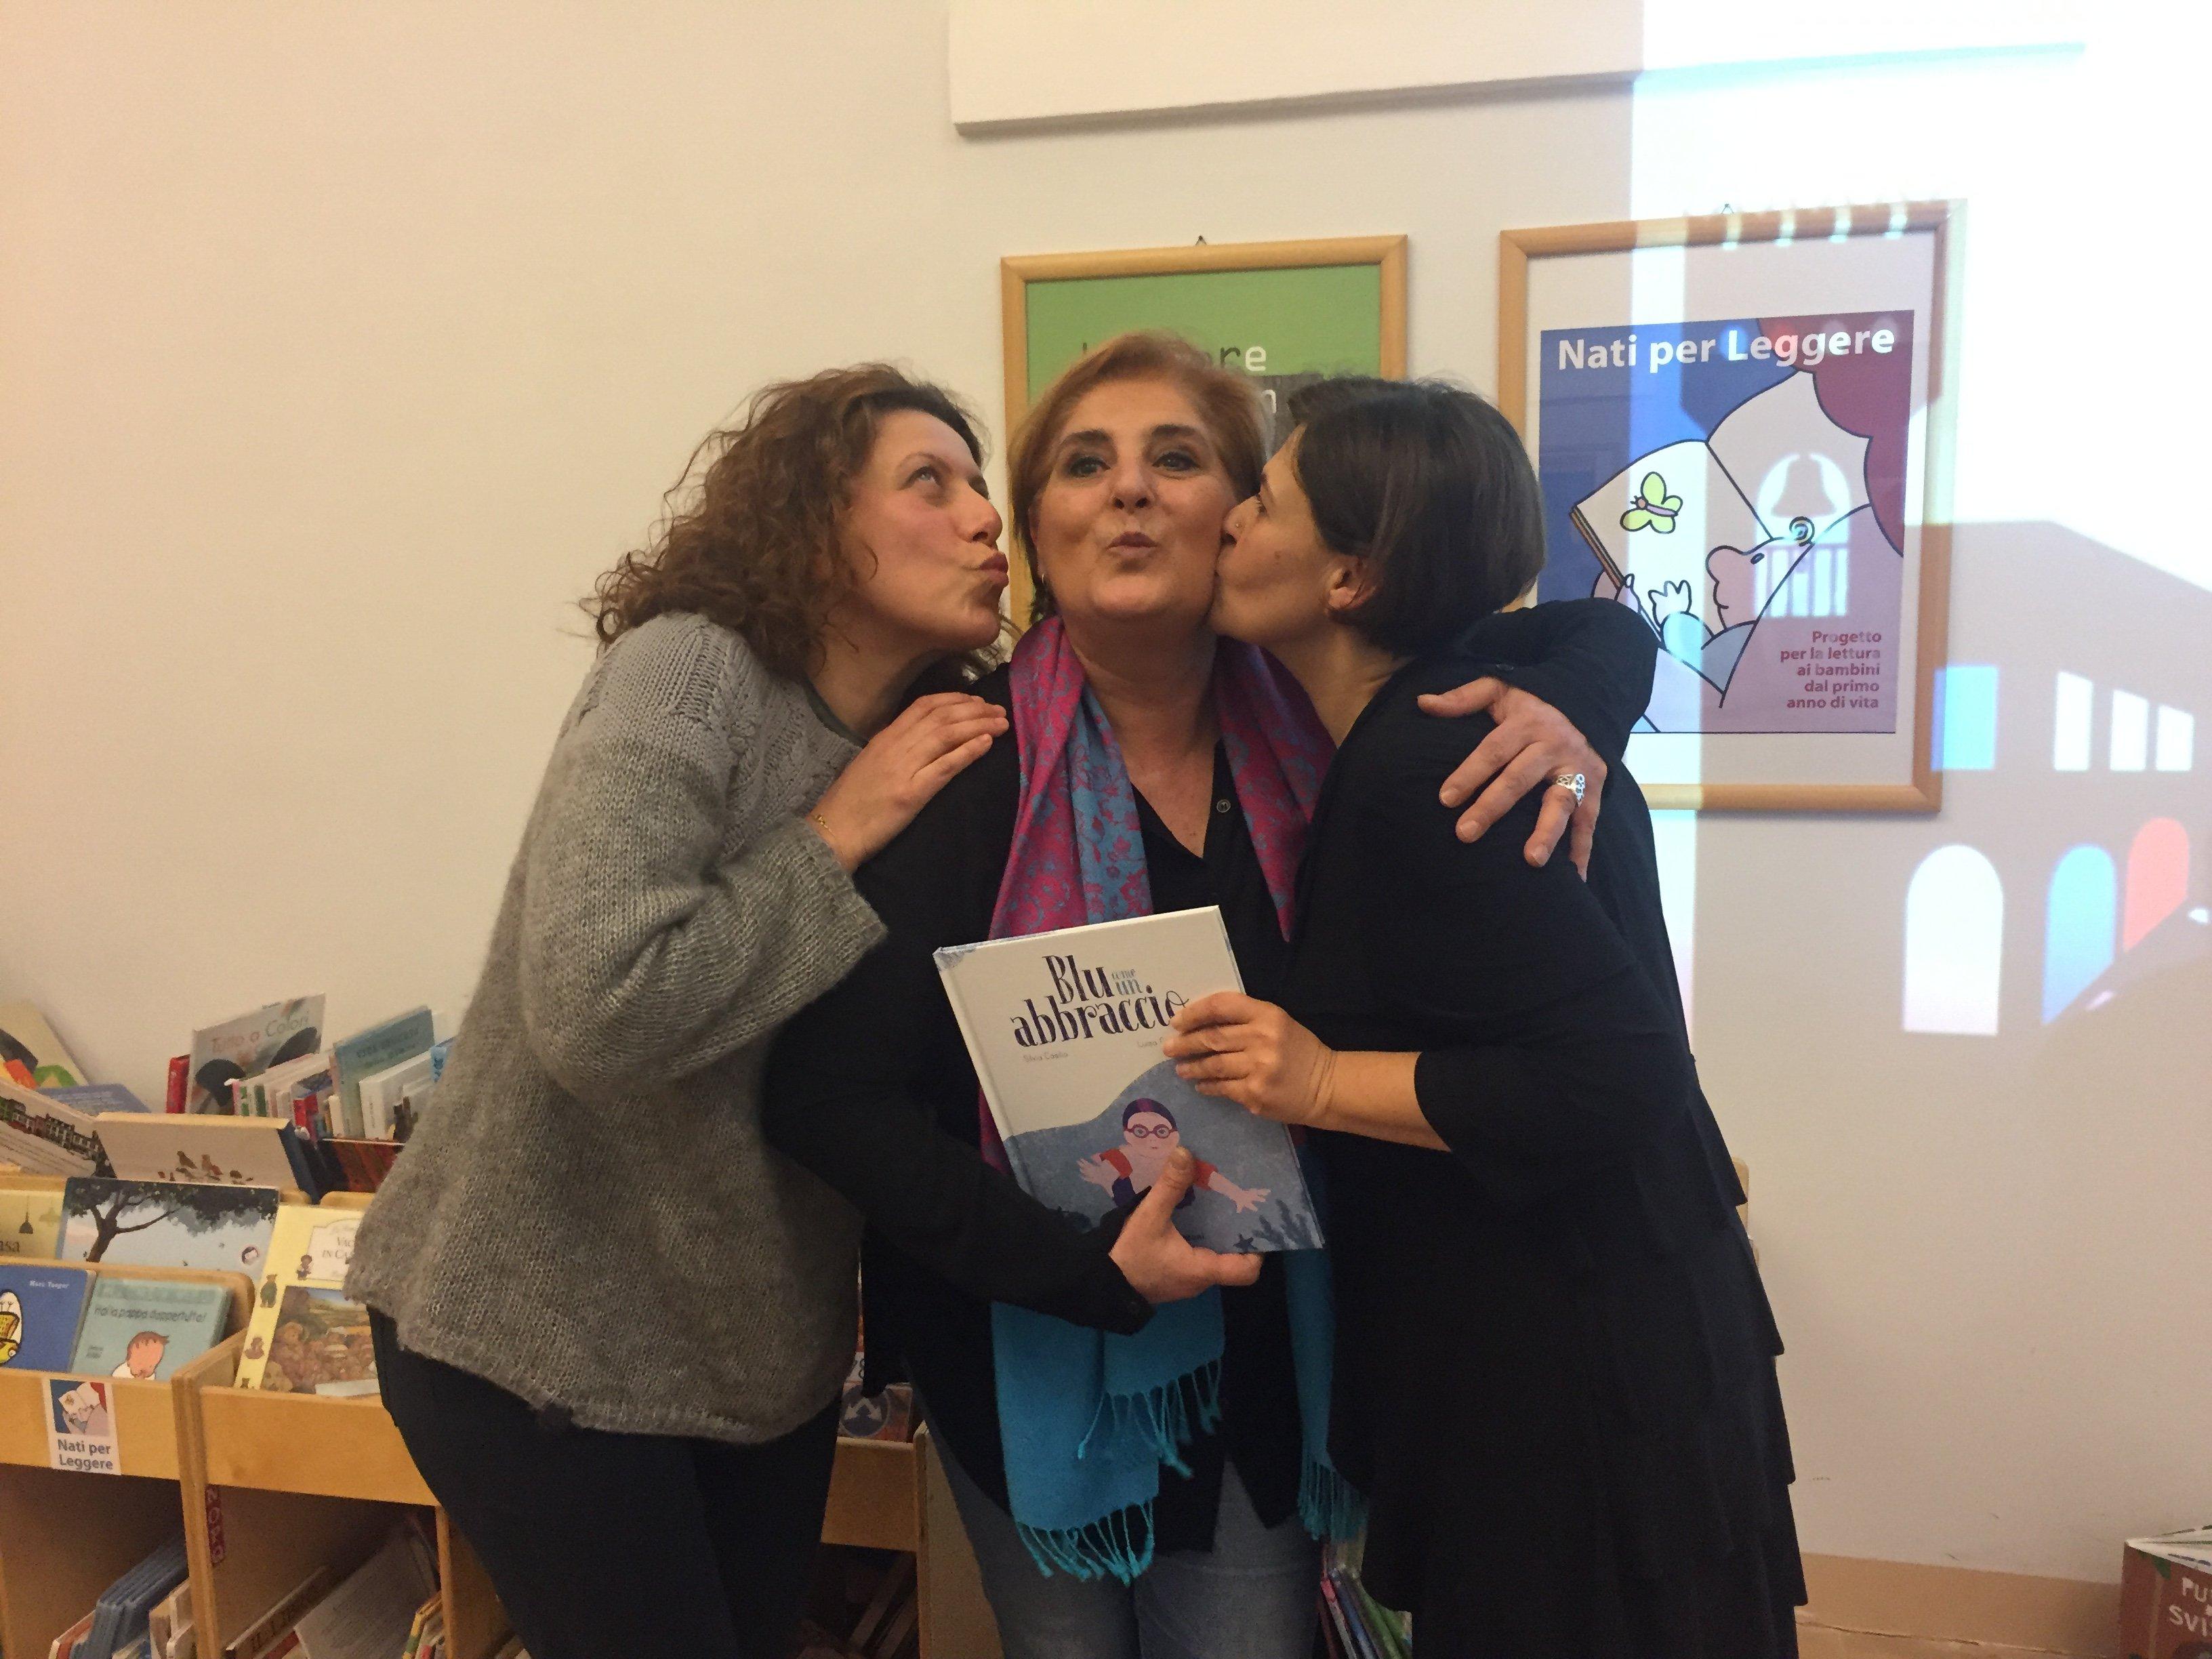 Luisa Gianfelici Elena Carrano Silvia Casilio